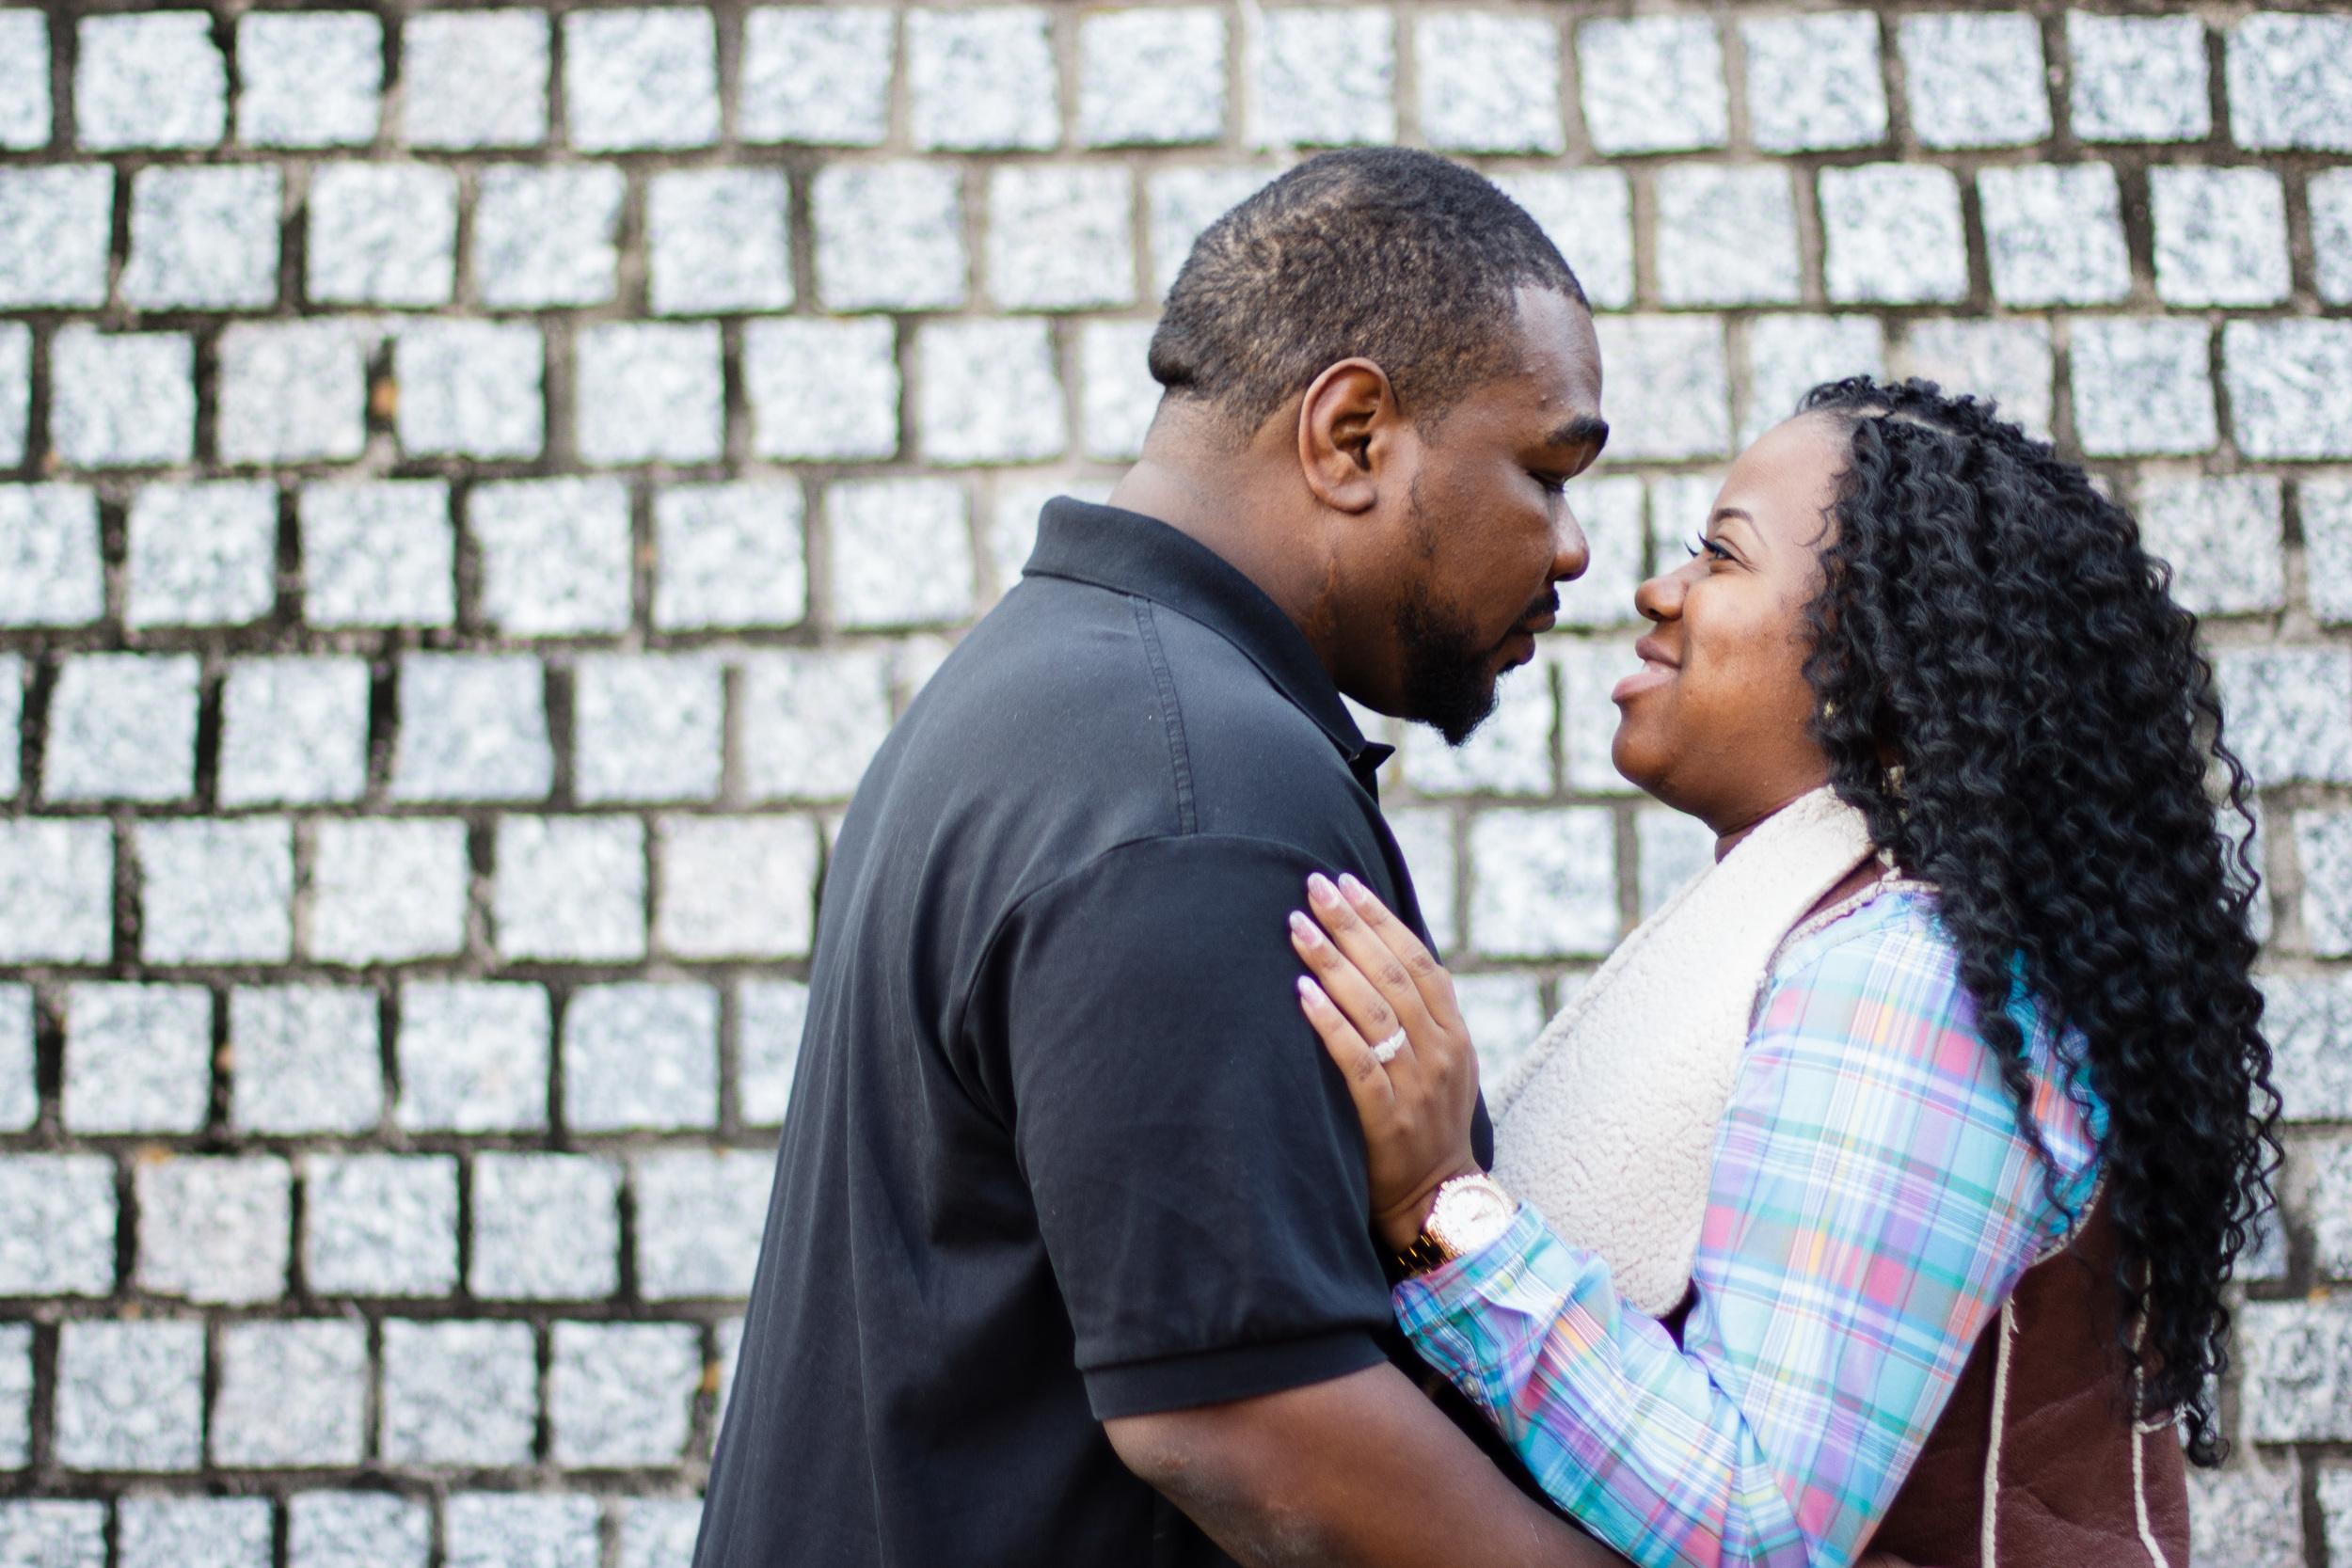 Kendra + Terrance | Greenville NC Engagement Portraits | Eastern + Greenville NC Photographer | Bryant Tyson Photography | www.memoriesbybryant.com